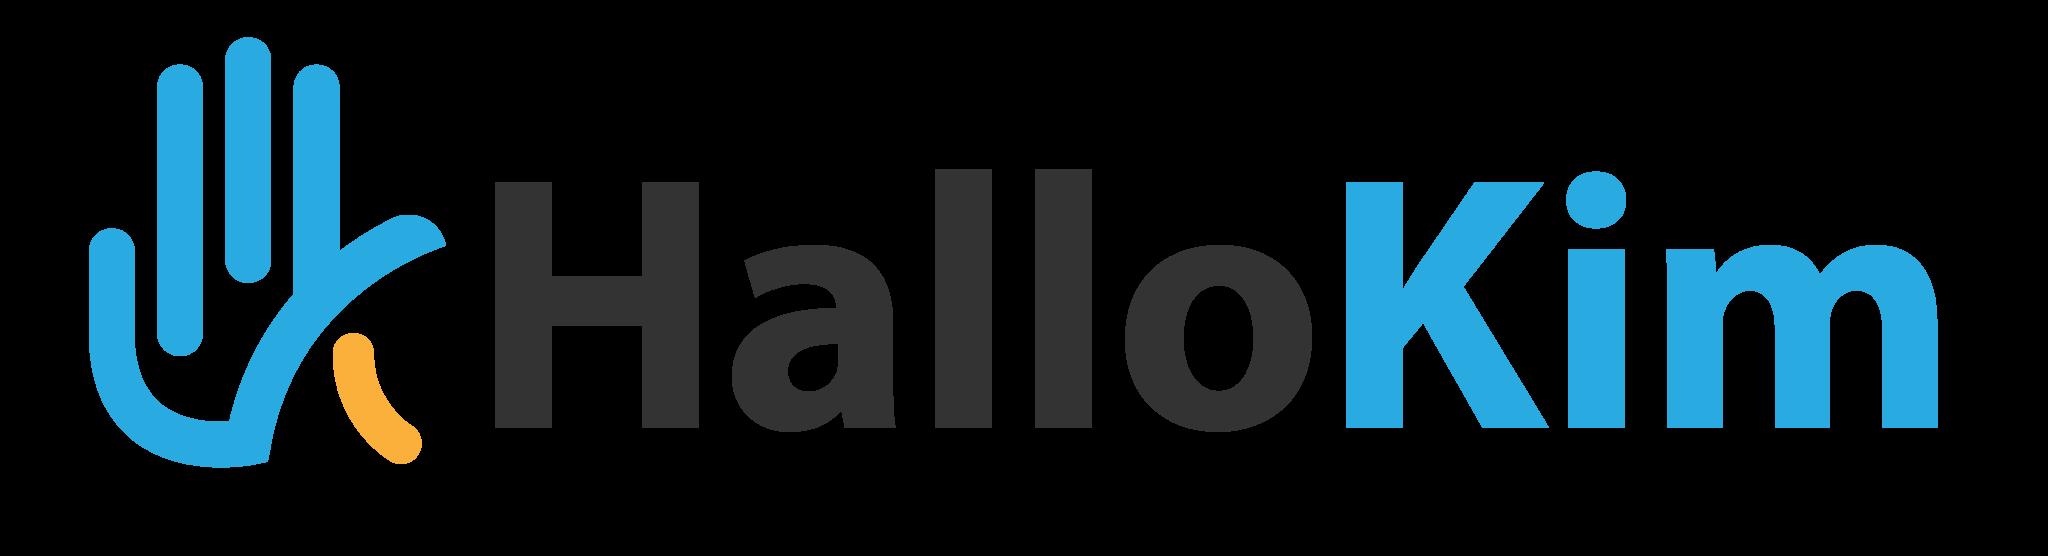 Logo baru hallokim